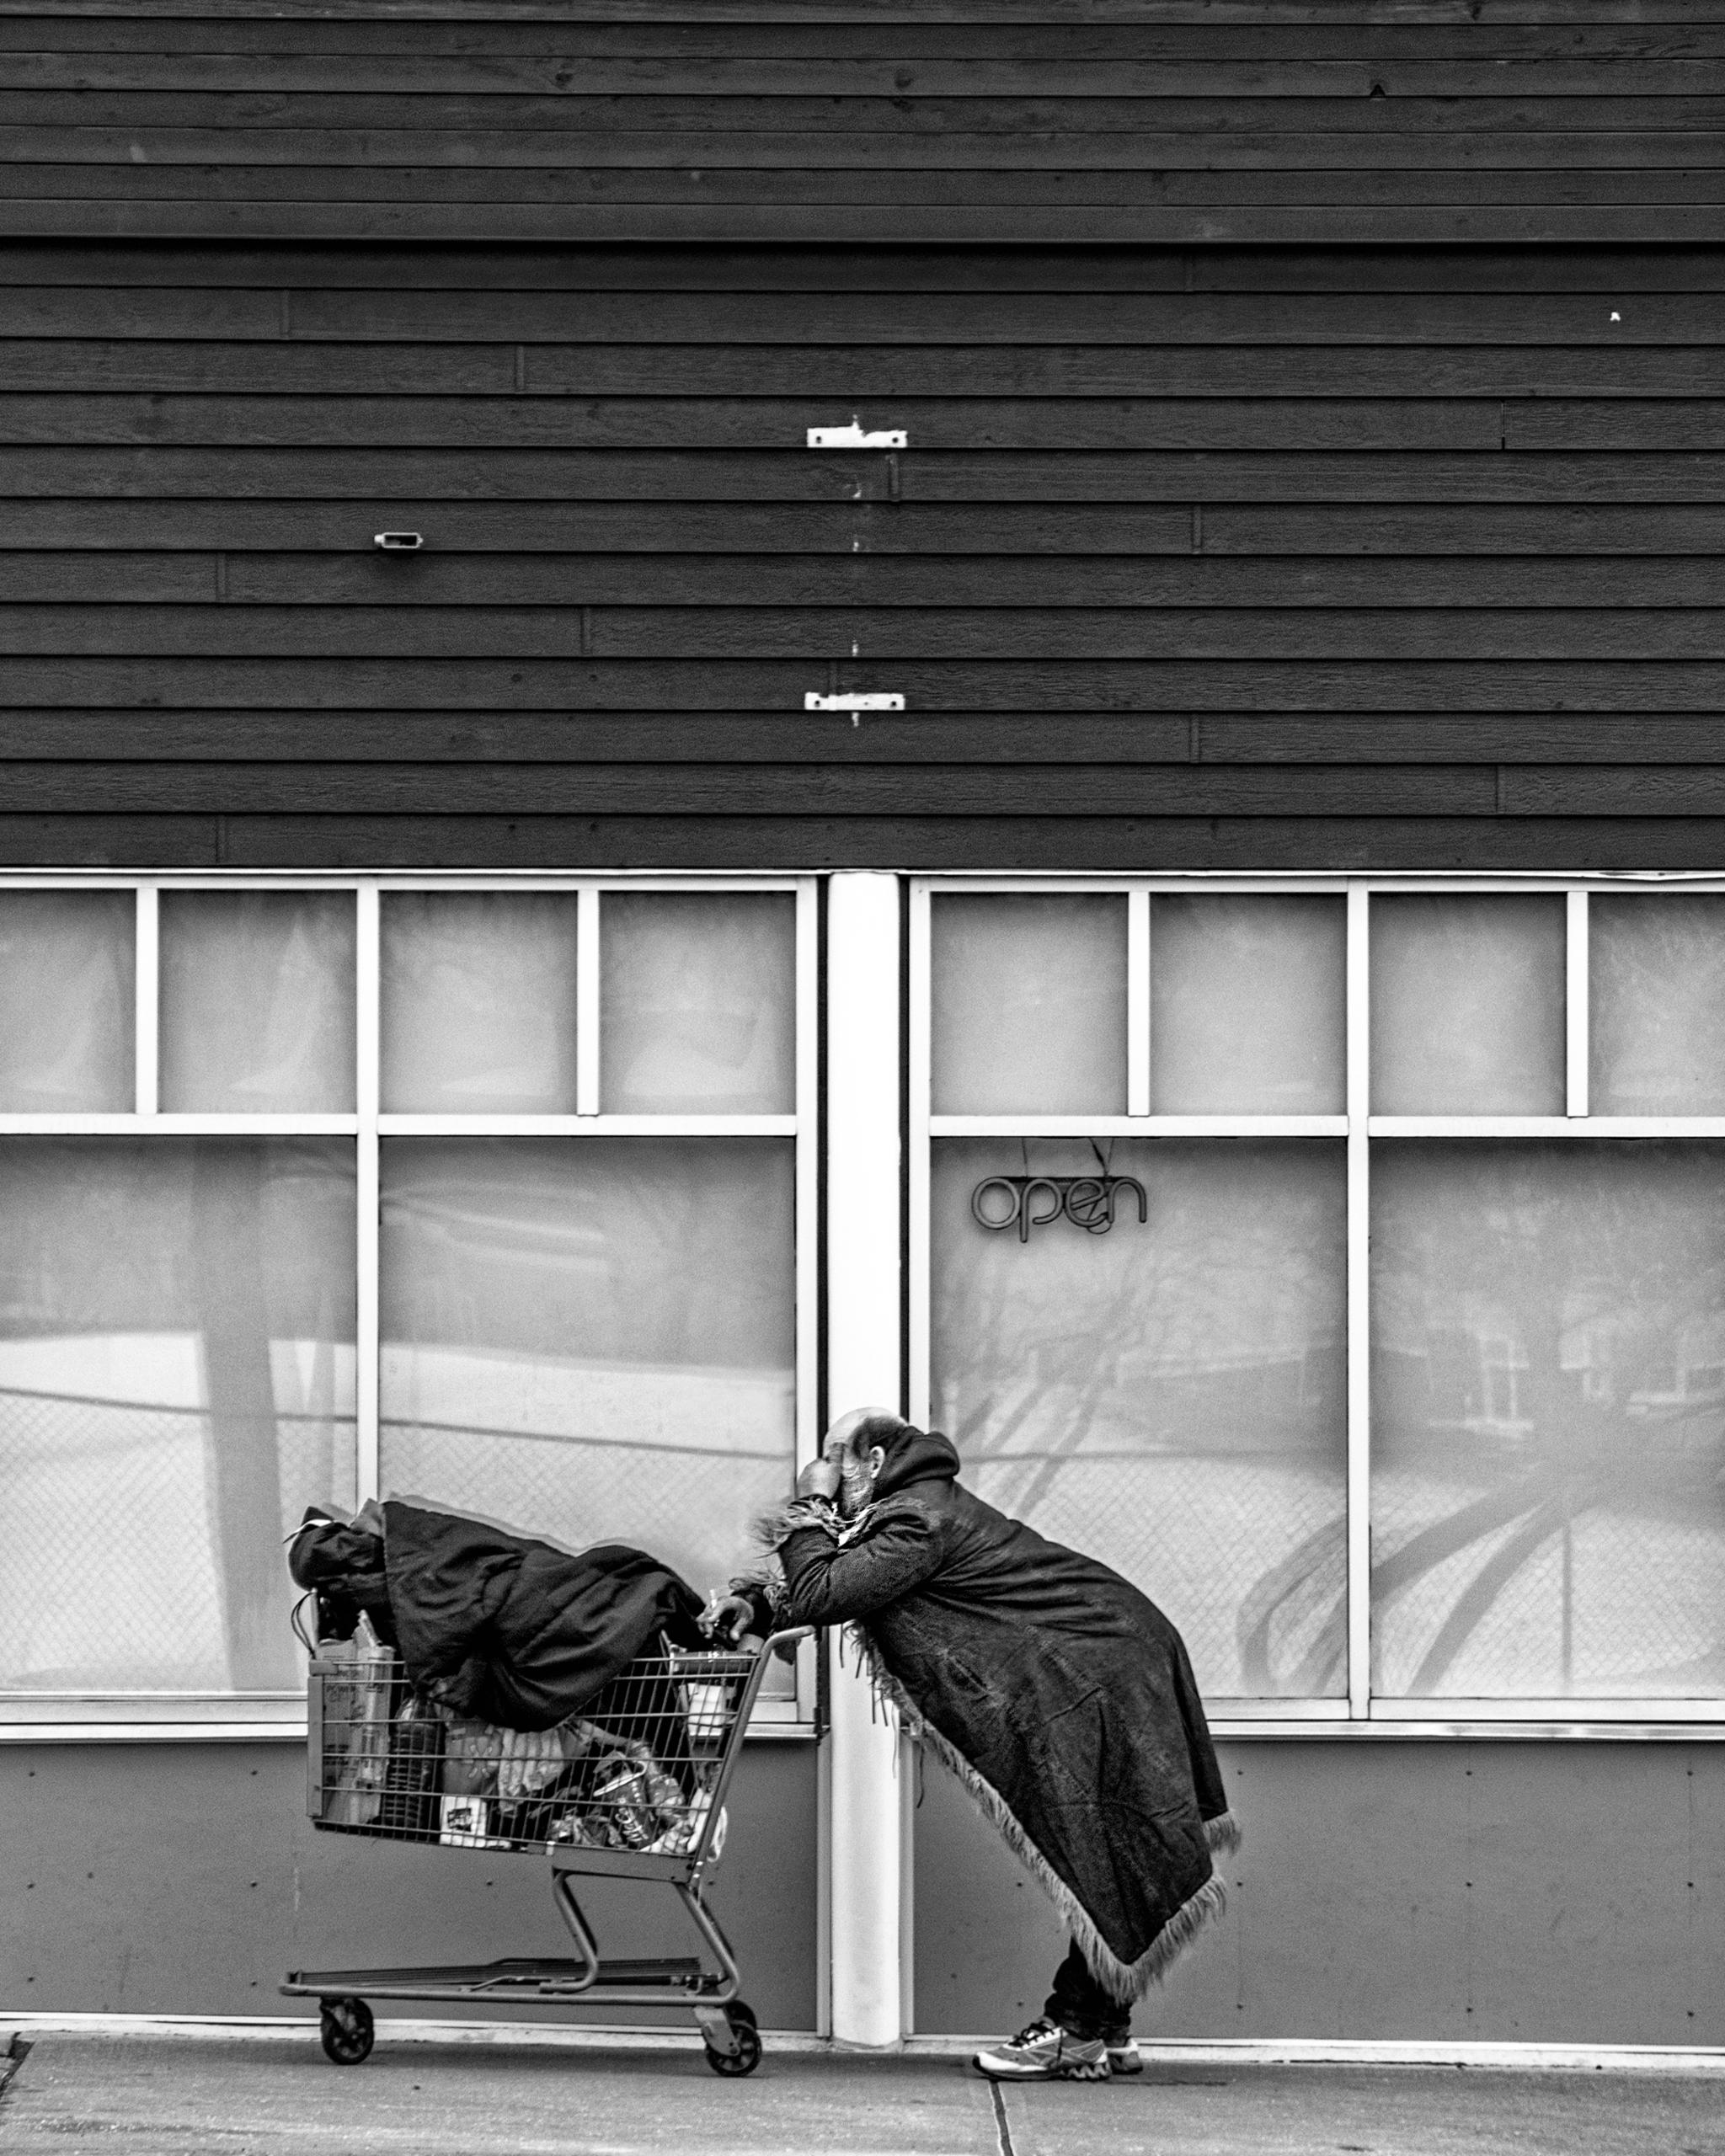 Open - blackandwhitephotography - jeff_day | ello